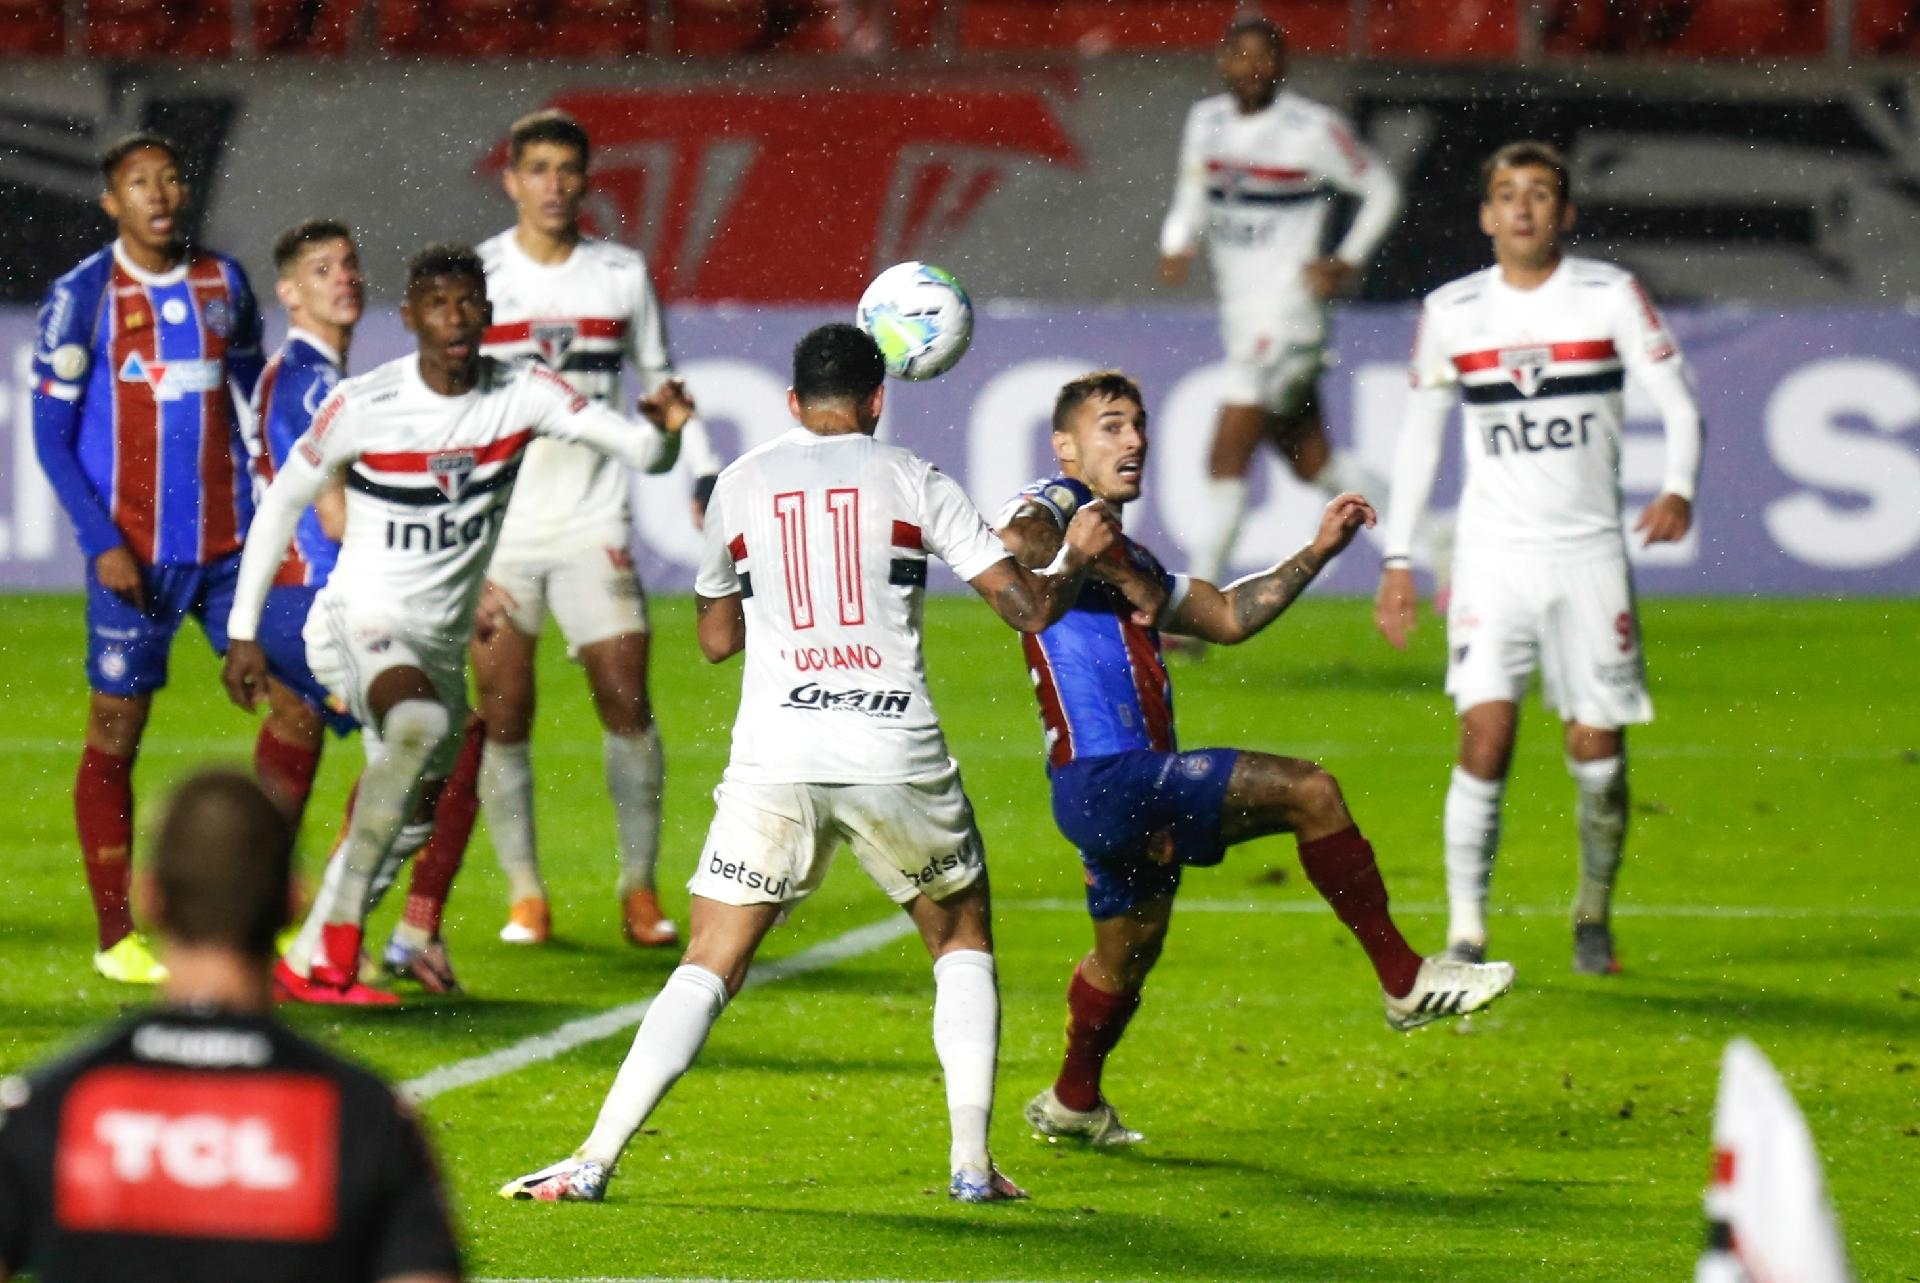 Sao Paulo Times Uol Esporte